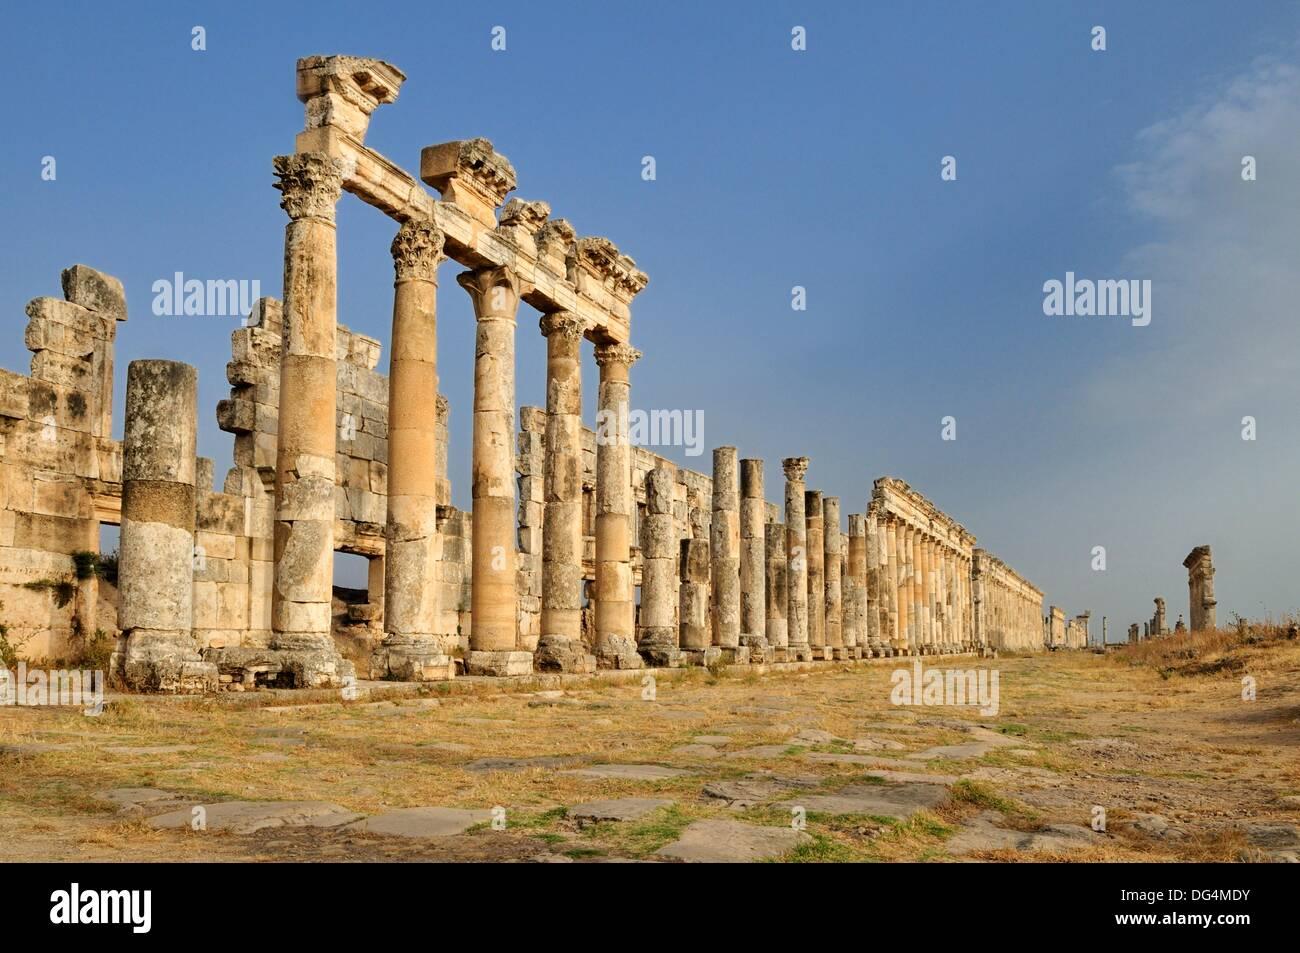 ruins at the roman archeological site of Apameia, Apamea, Qalaat al Mudiq, Syria, Middle East, West Asia - Stock Image